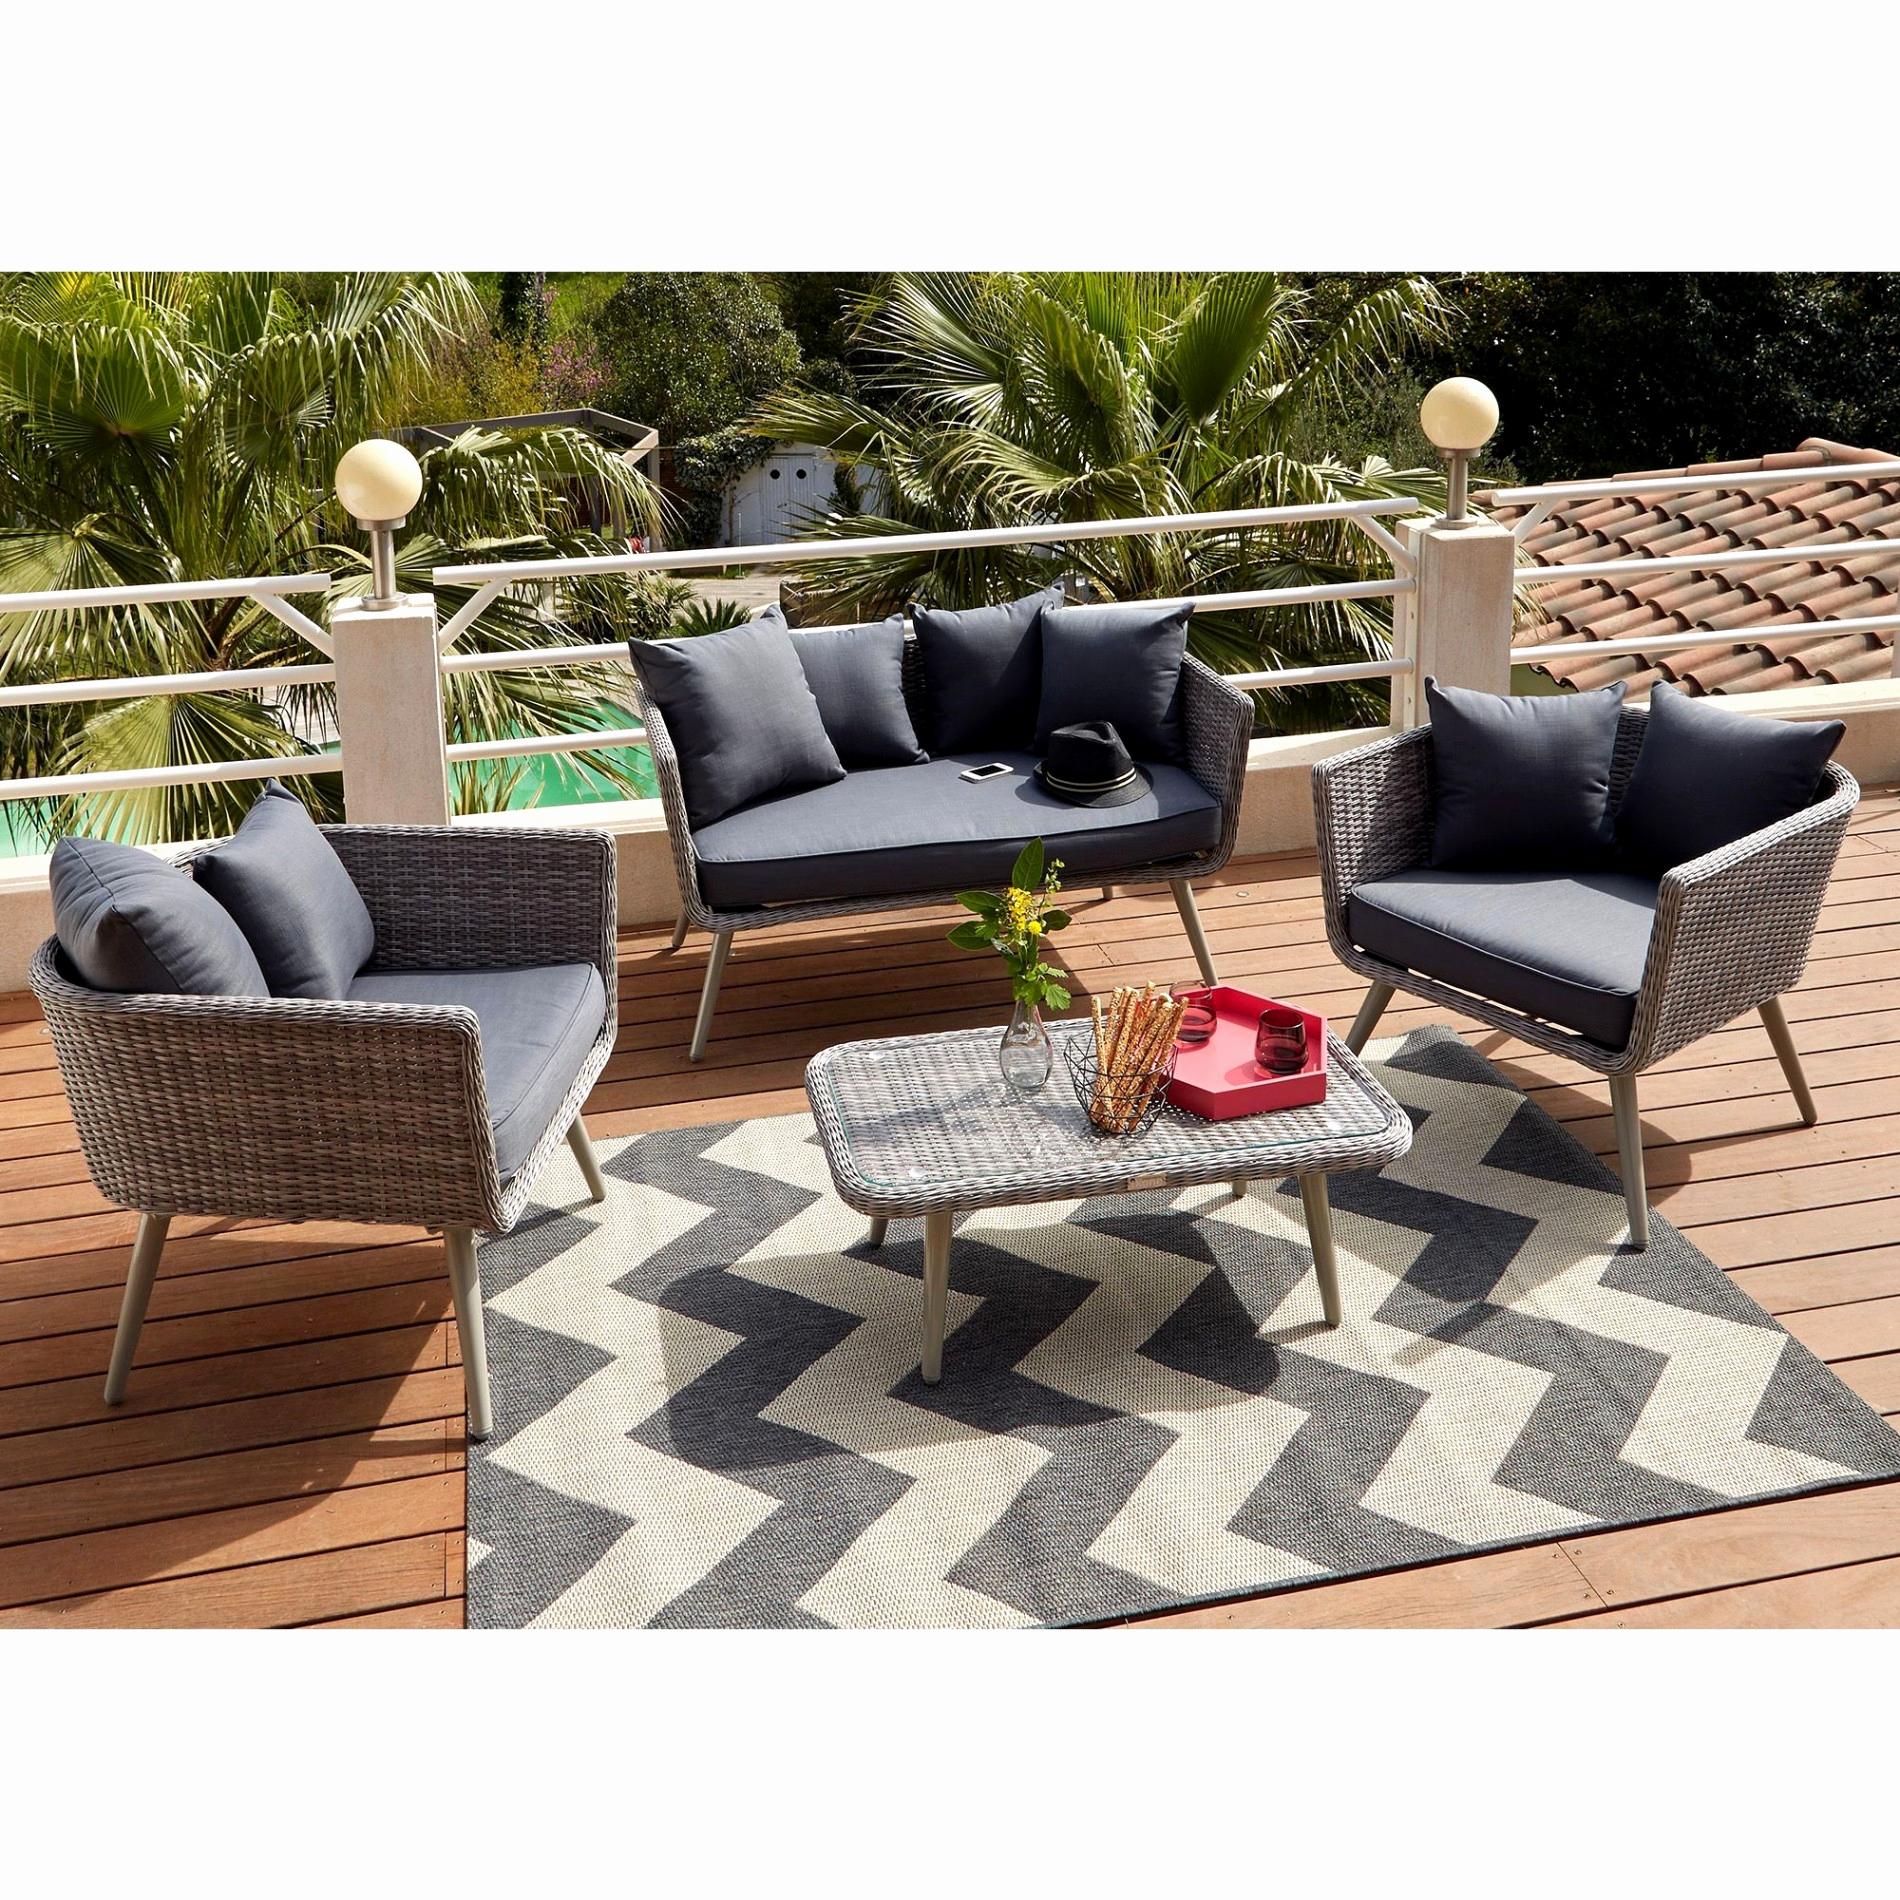 fabriquer un salon de jardin en bois frais meuble jardin design creatif mobilier jardin design lavender plum of fabriquer un salon de jardin en bois